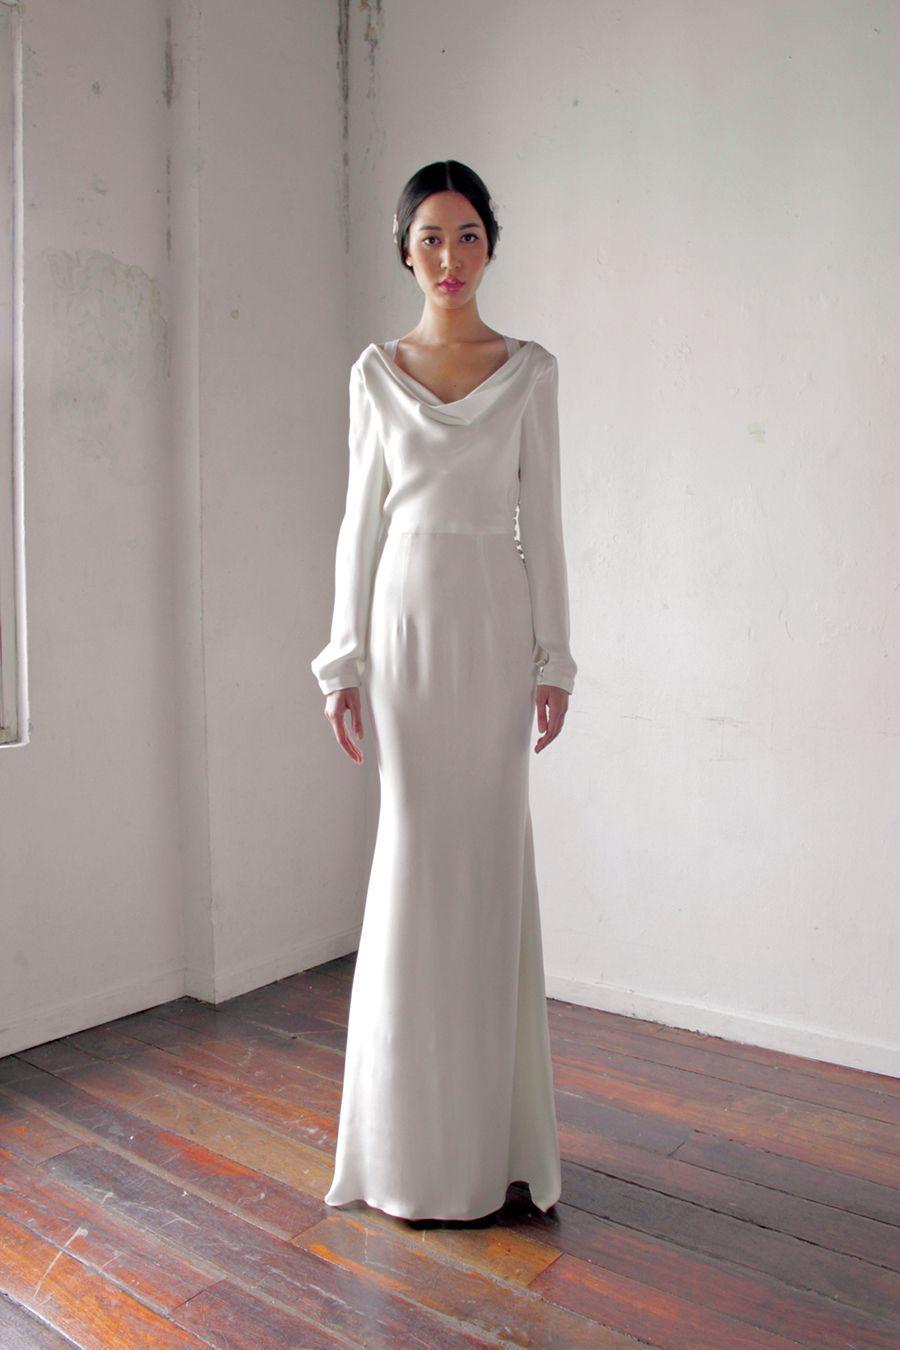 Five Questions With Designer Alia Bastamam Winter Wedding Dress Cowl Neck Wedding Dress Malay Wedding Dress